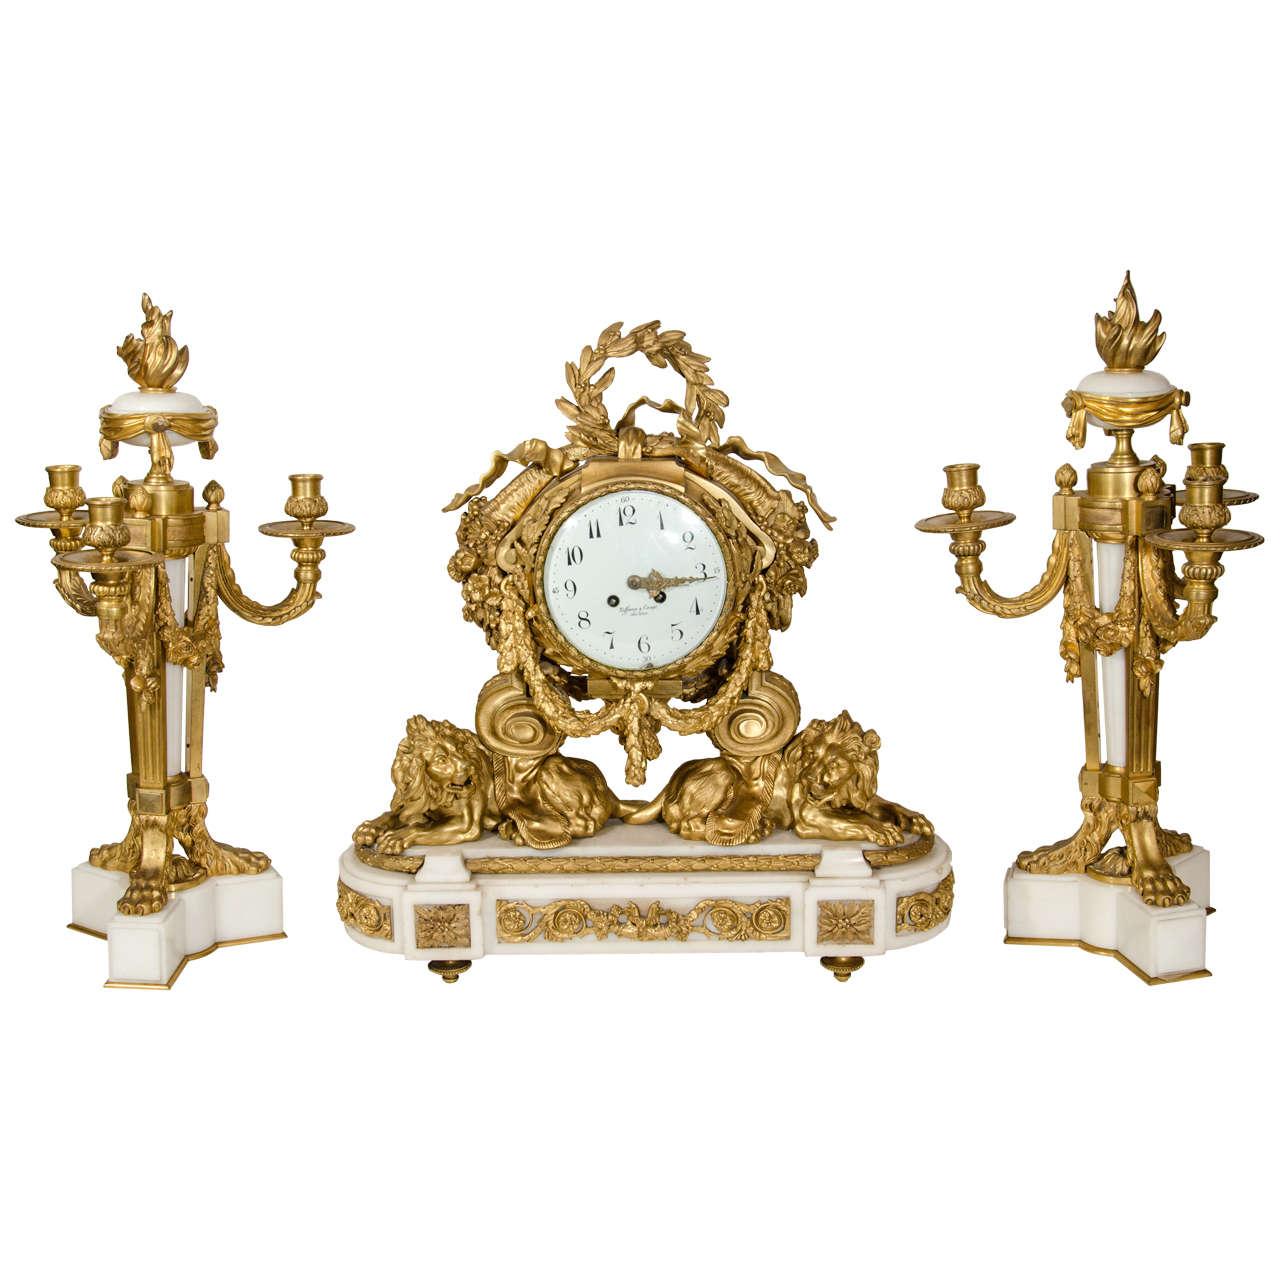 Superb Antique French Louis Xvi Tiffany Clock Set 19th